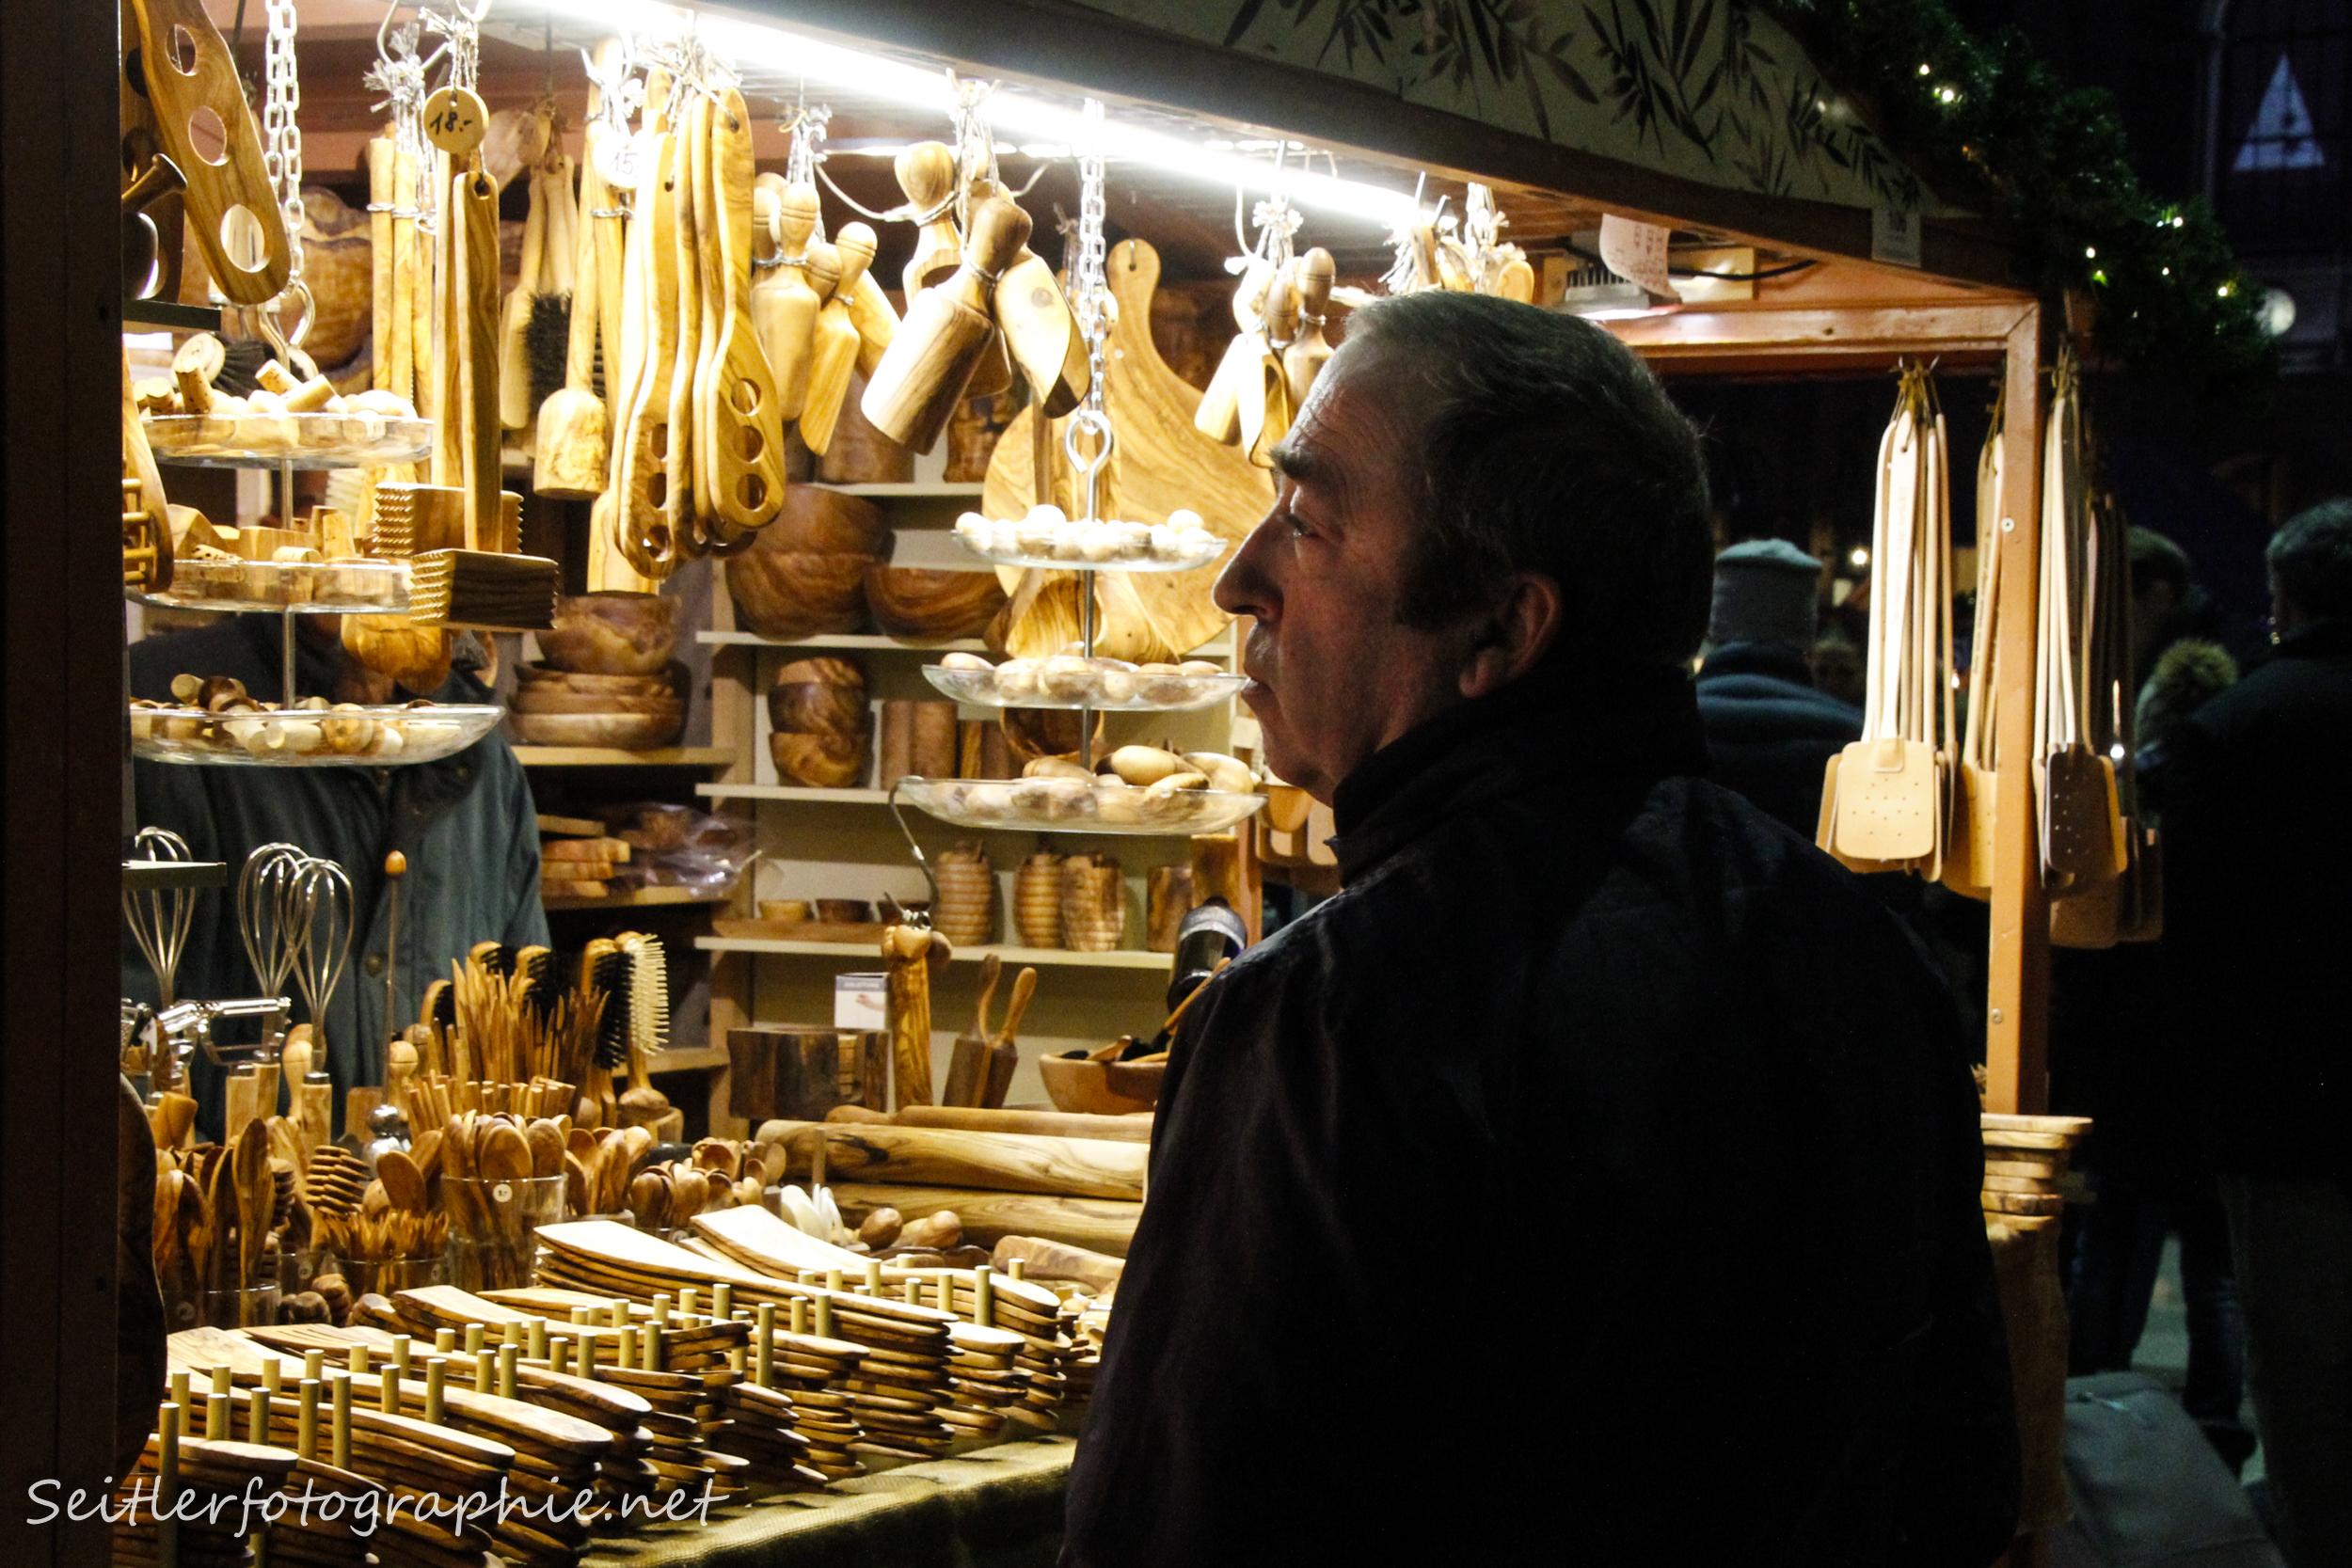 20161127_weihnachtsmarkt_joannarutkoseitler_25